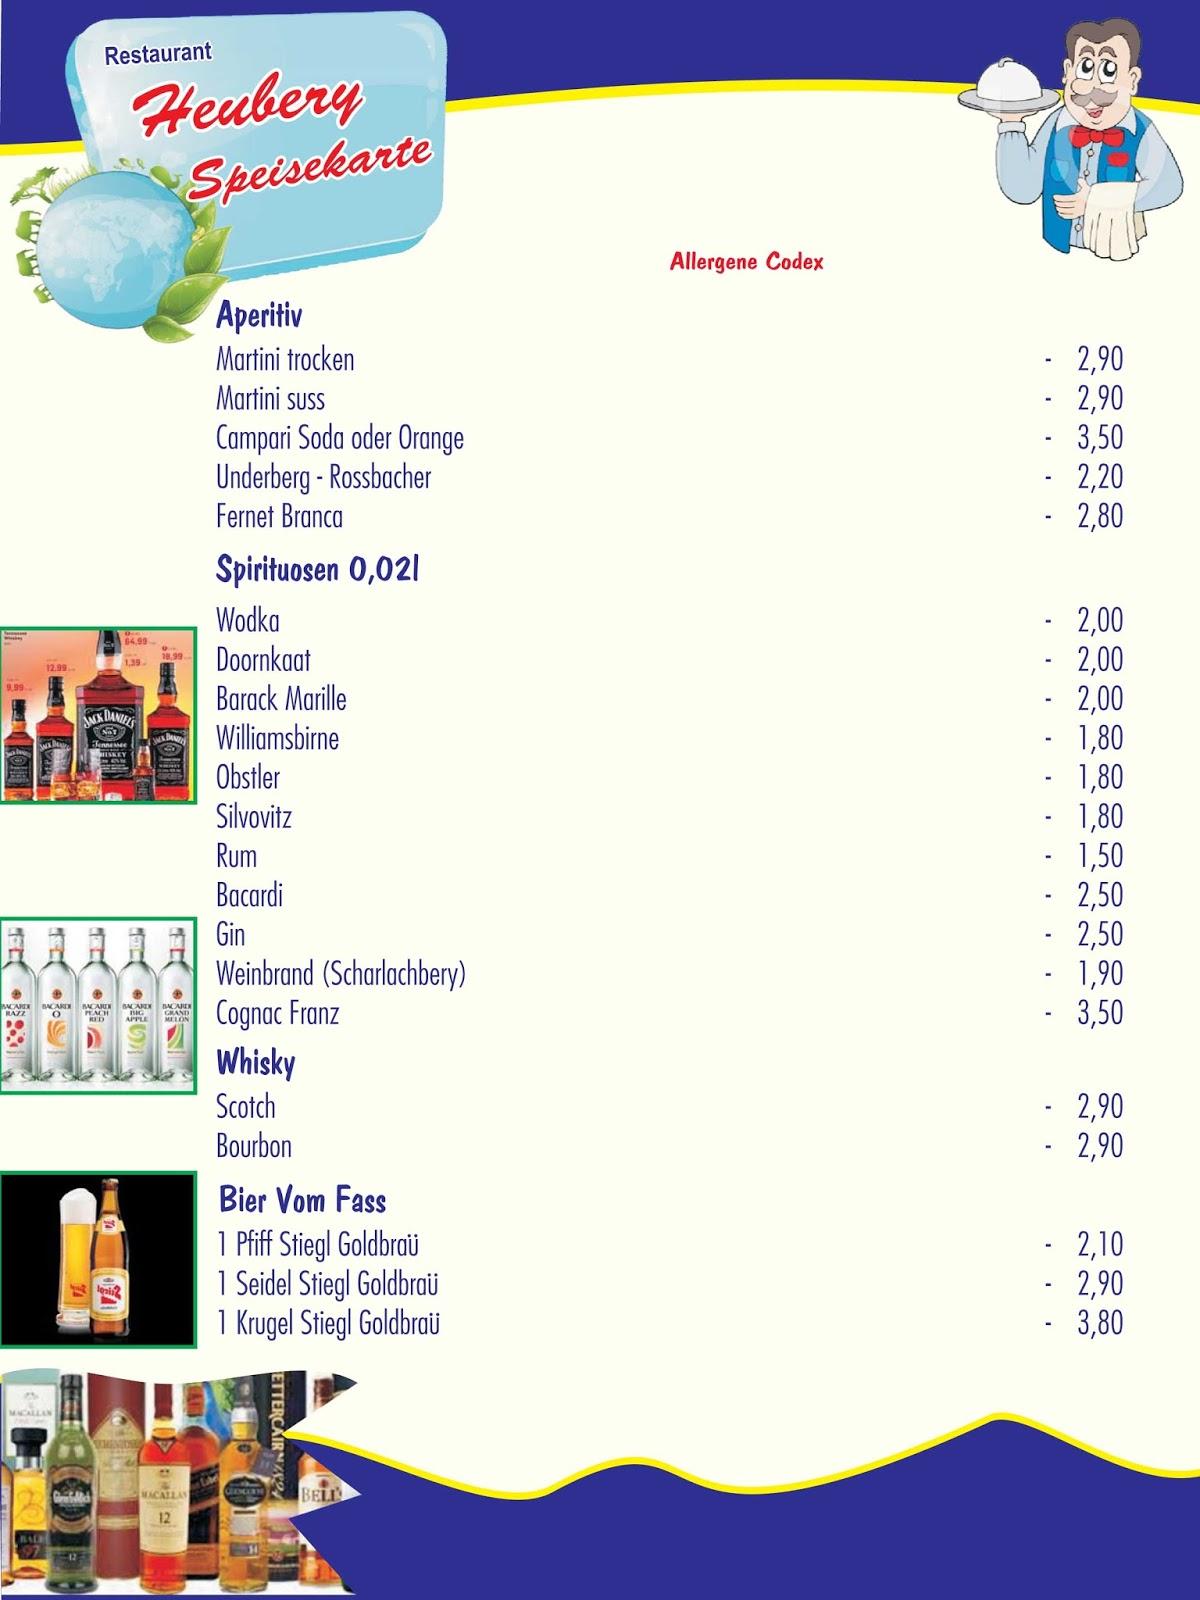 Restaurant am Heuberg 1170 Wien ☎ +43 1 48 98 210 Süd Indische ...